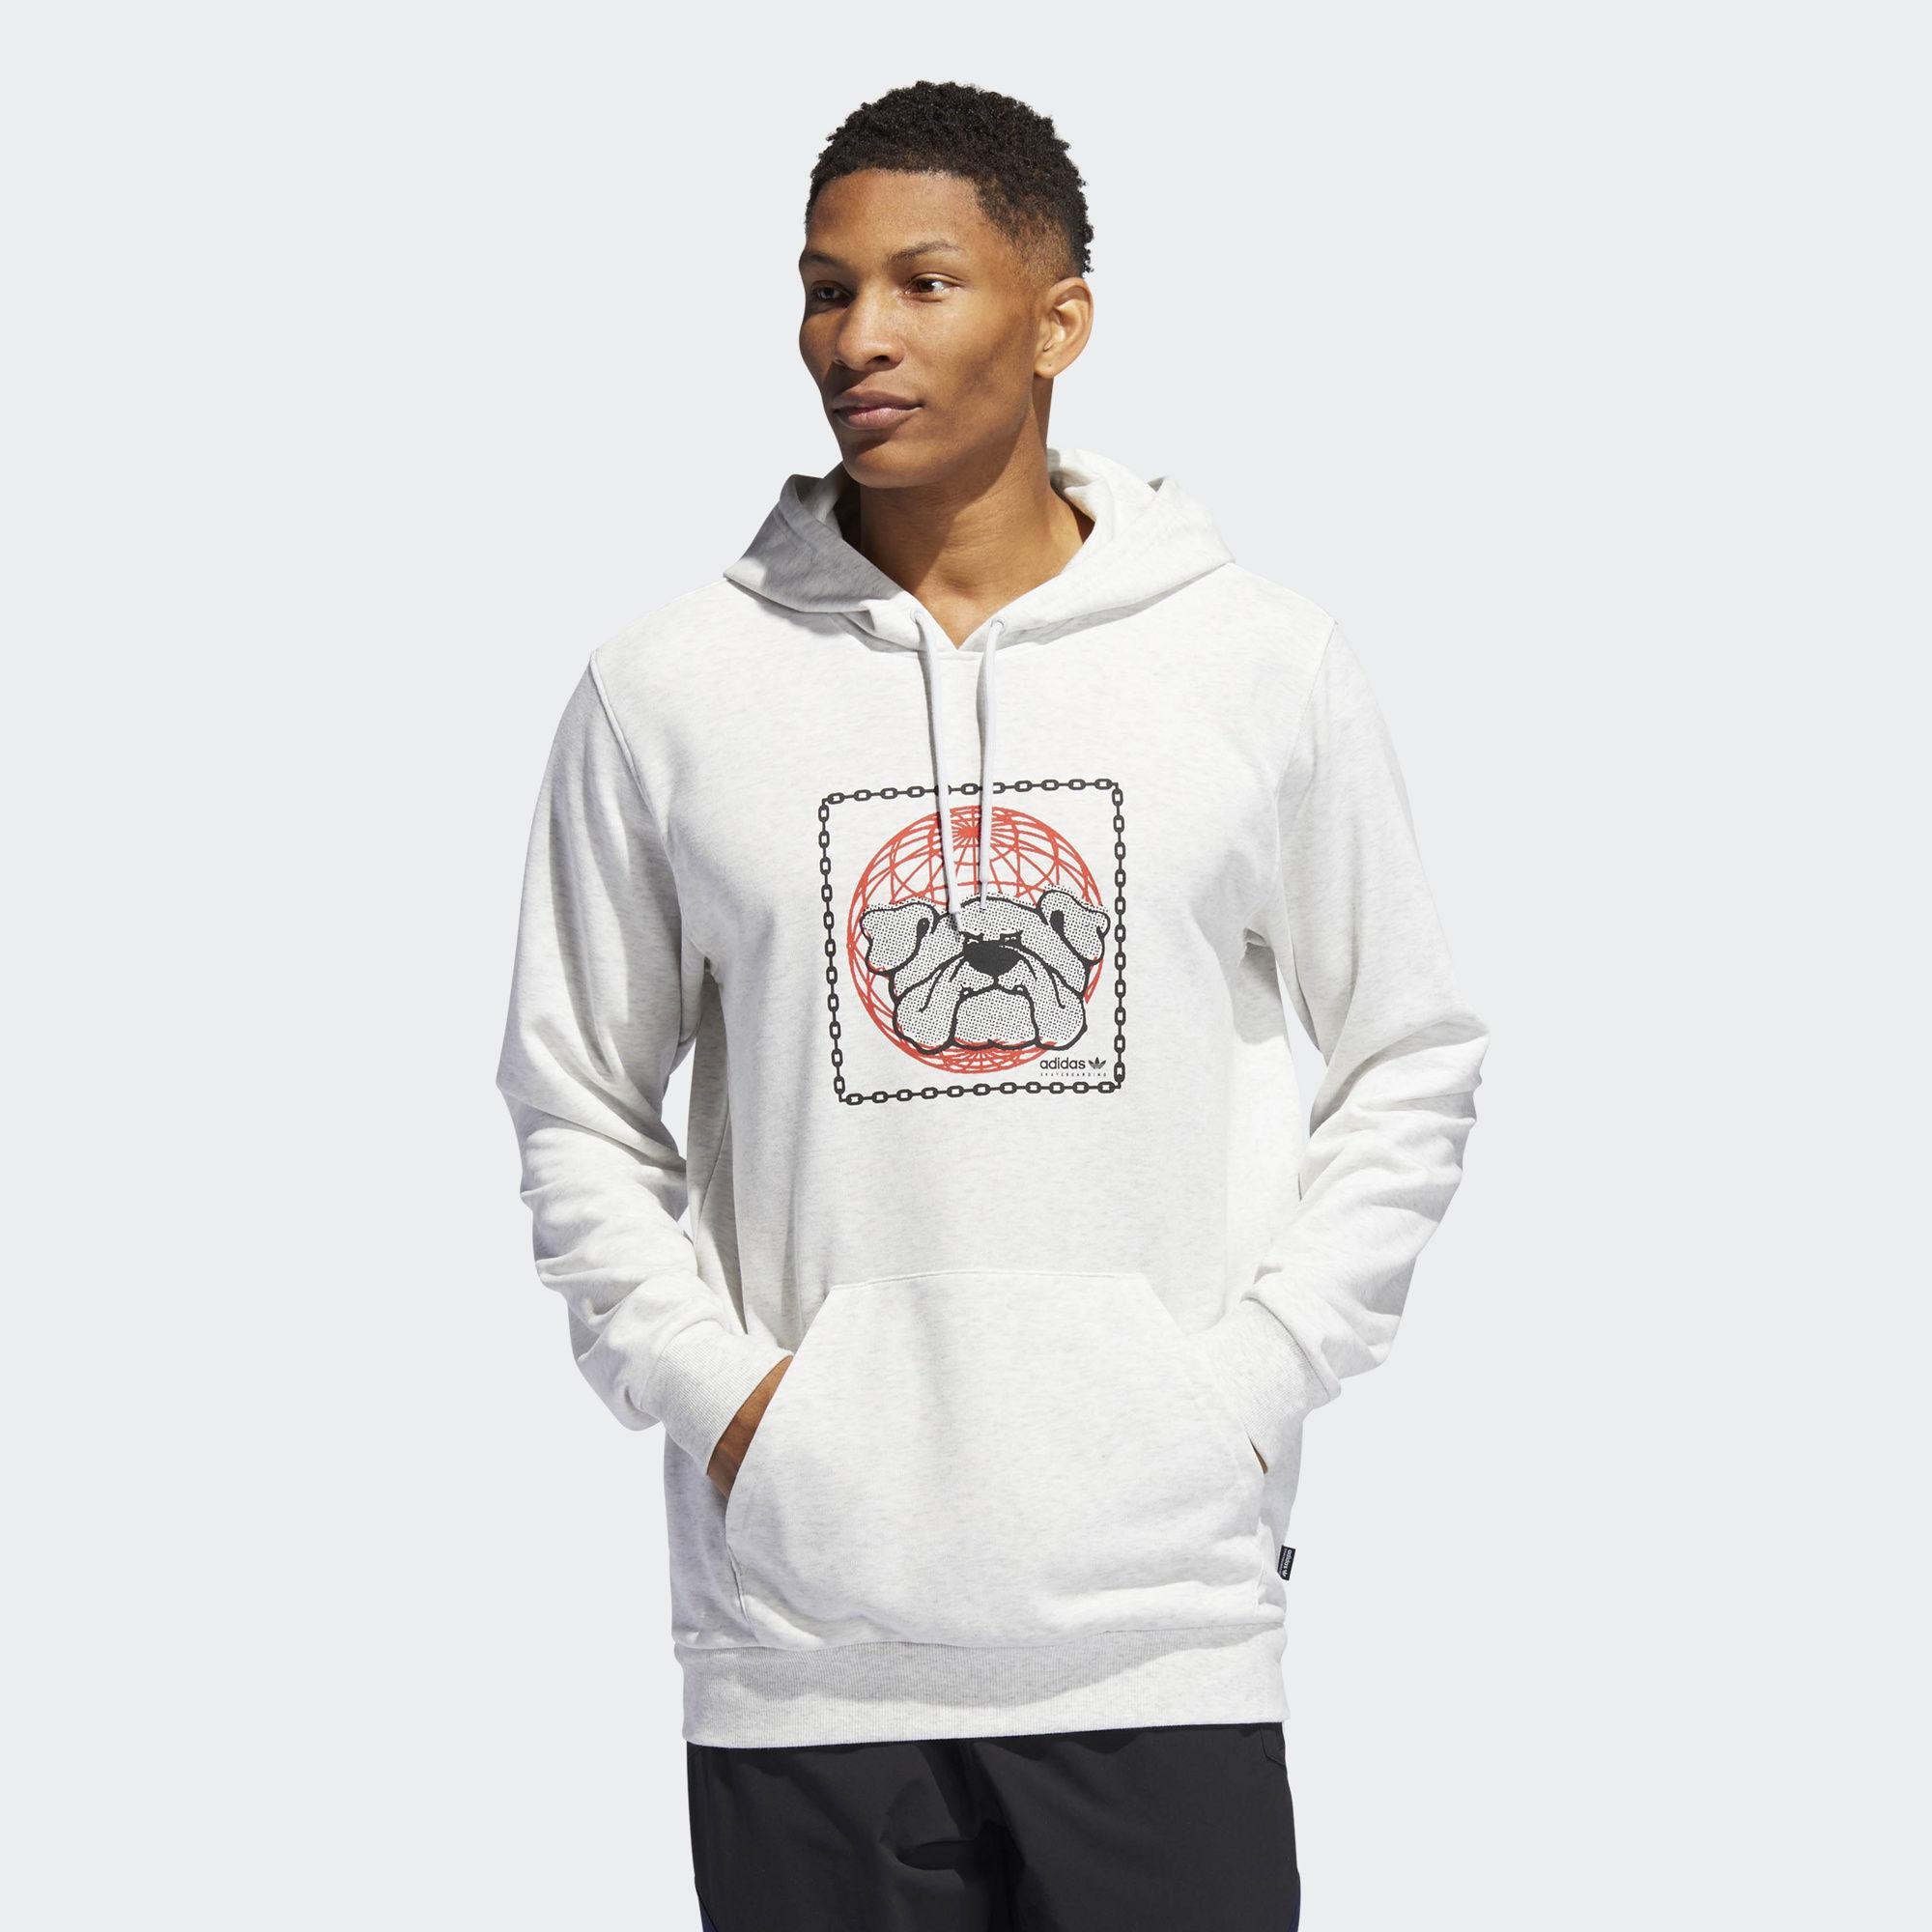 f3edf06a89ab Adidas - Multicolor Dunckley Hoodie for Men - Lyst. View fullscreen